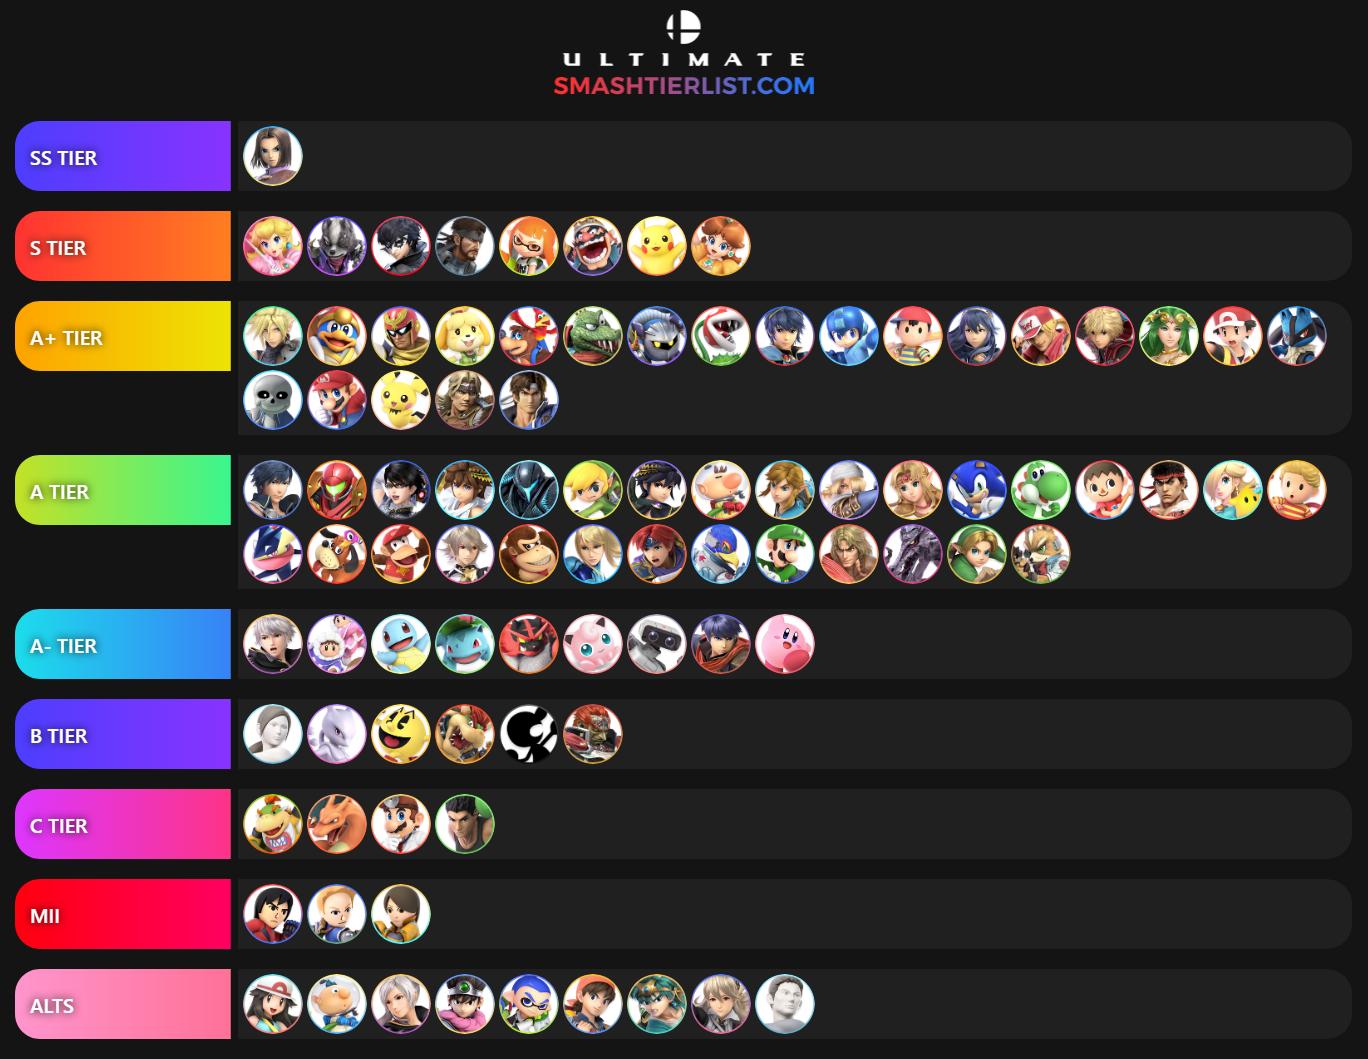 My *NEWER* Honest Tier List (My Opinion)